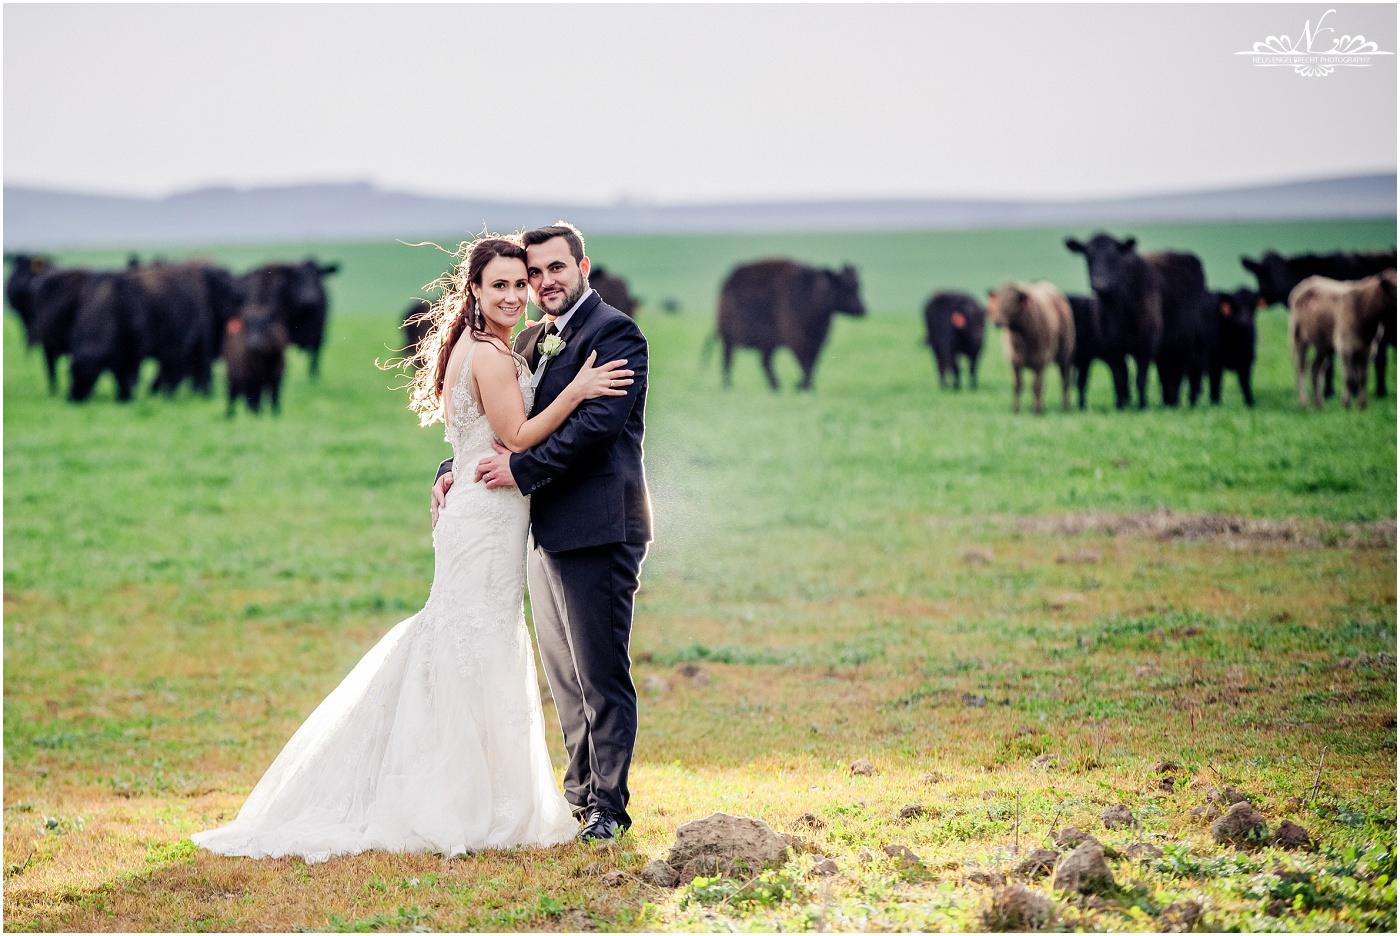 Eensgezind-Wedding-Photos-Nelis-Engelbrecht-Photography-163